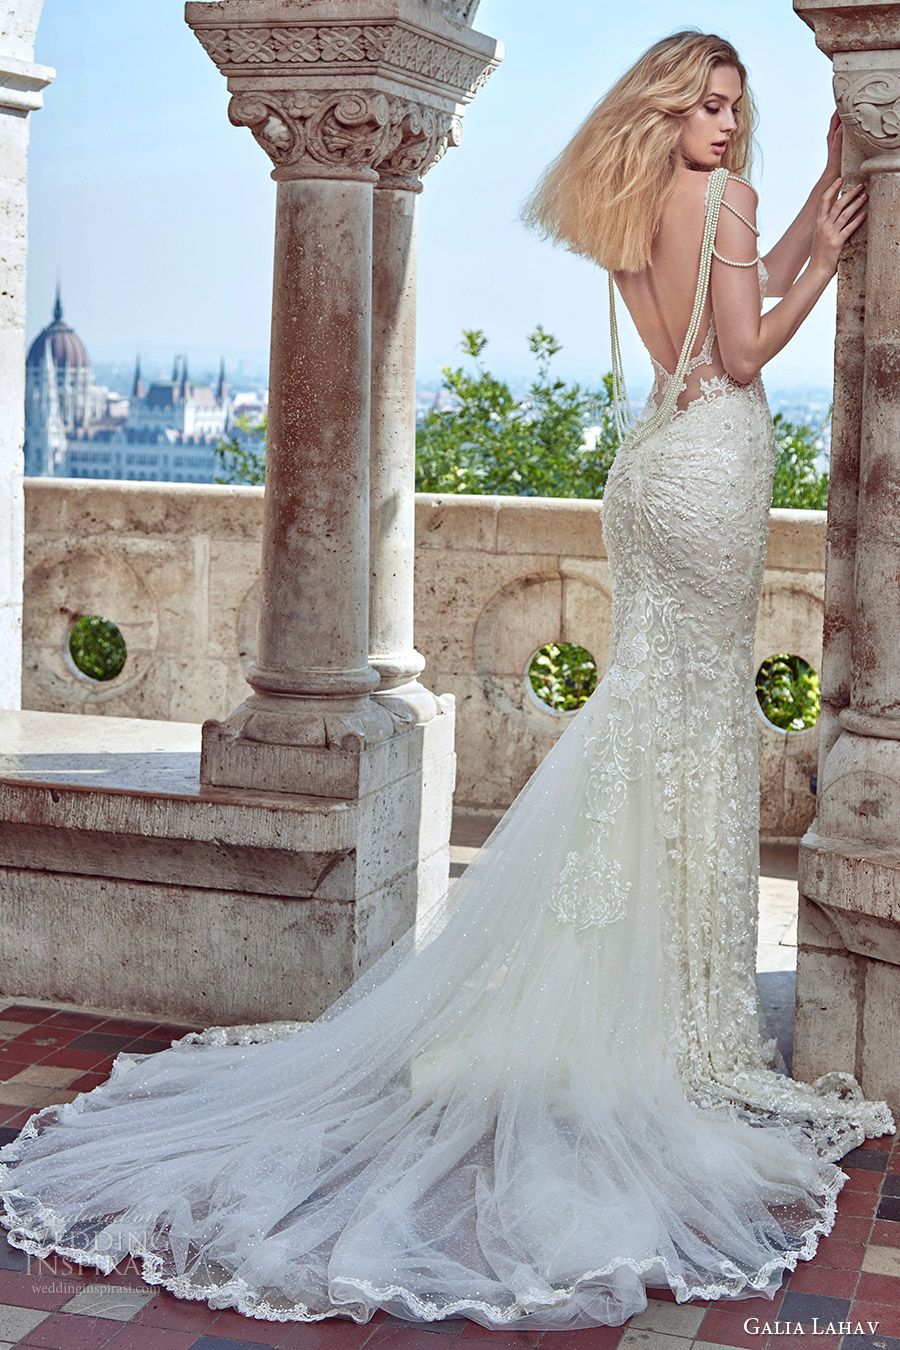 Galia lahav couture fall 2016 wedding dresses ivory for Fall lace wedding dress